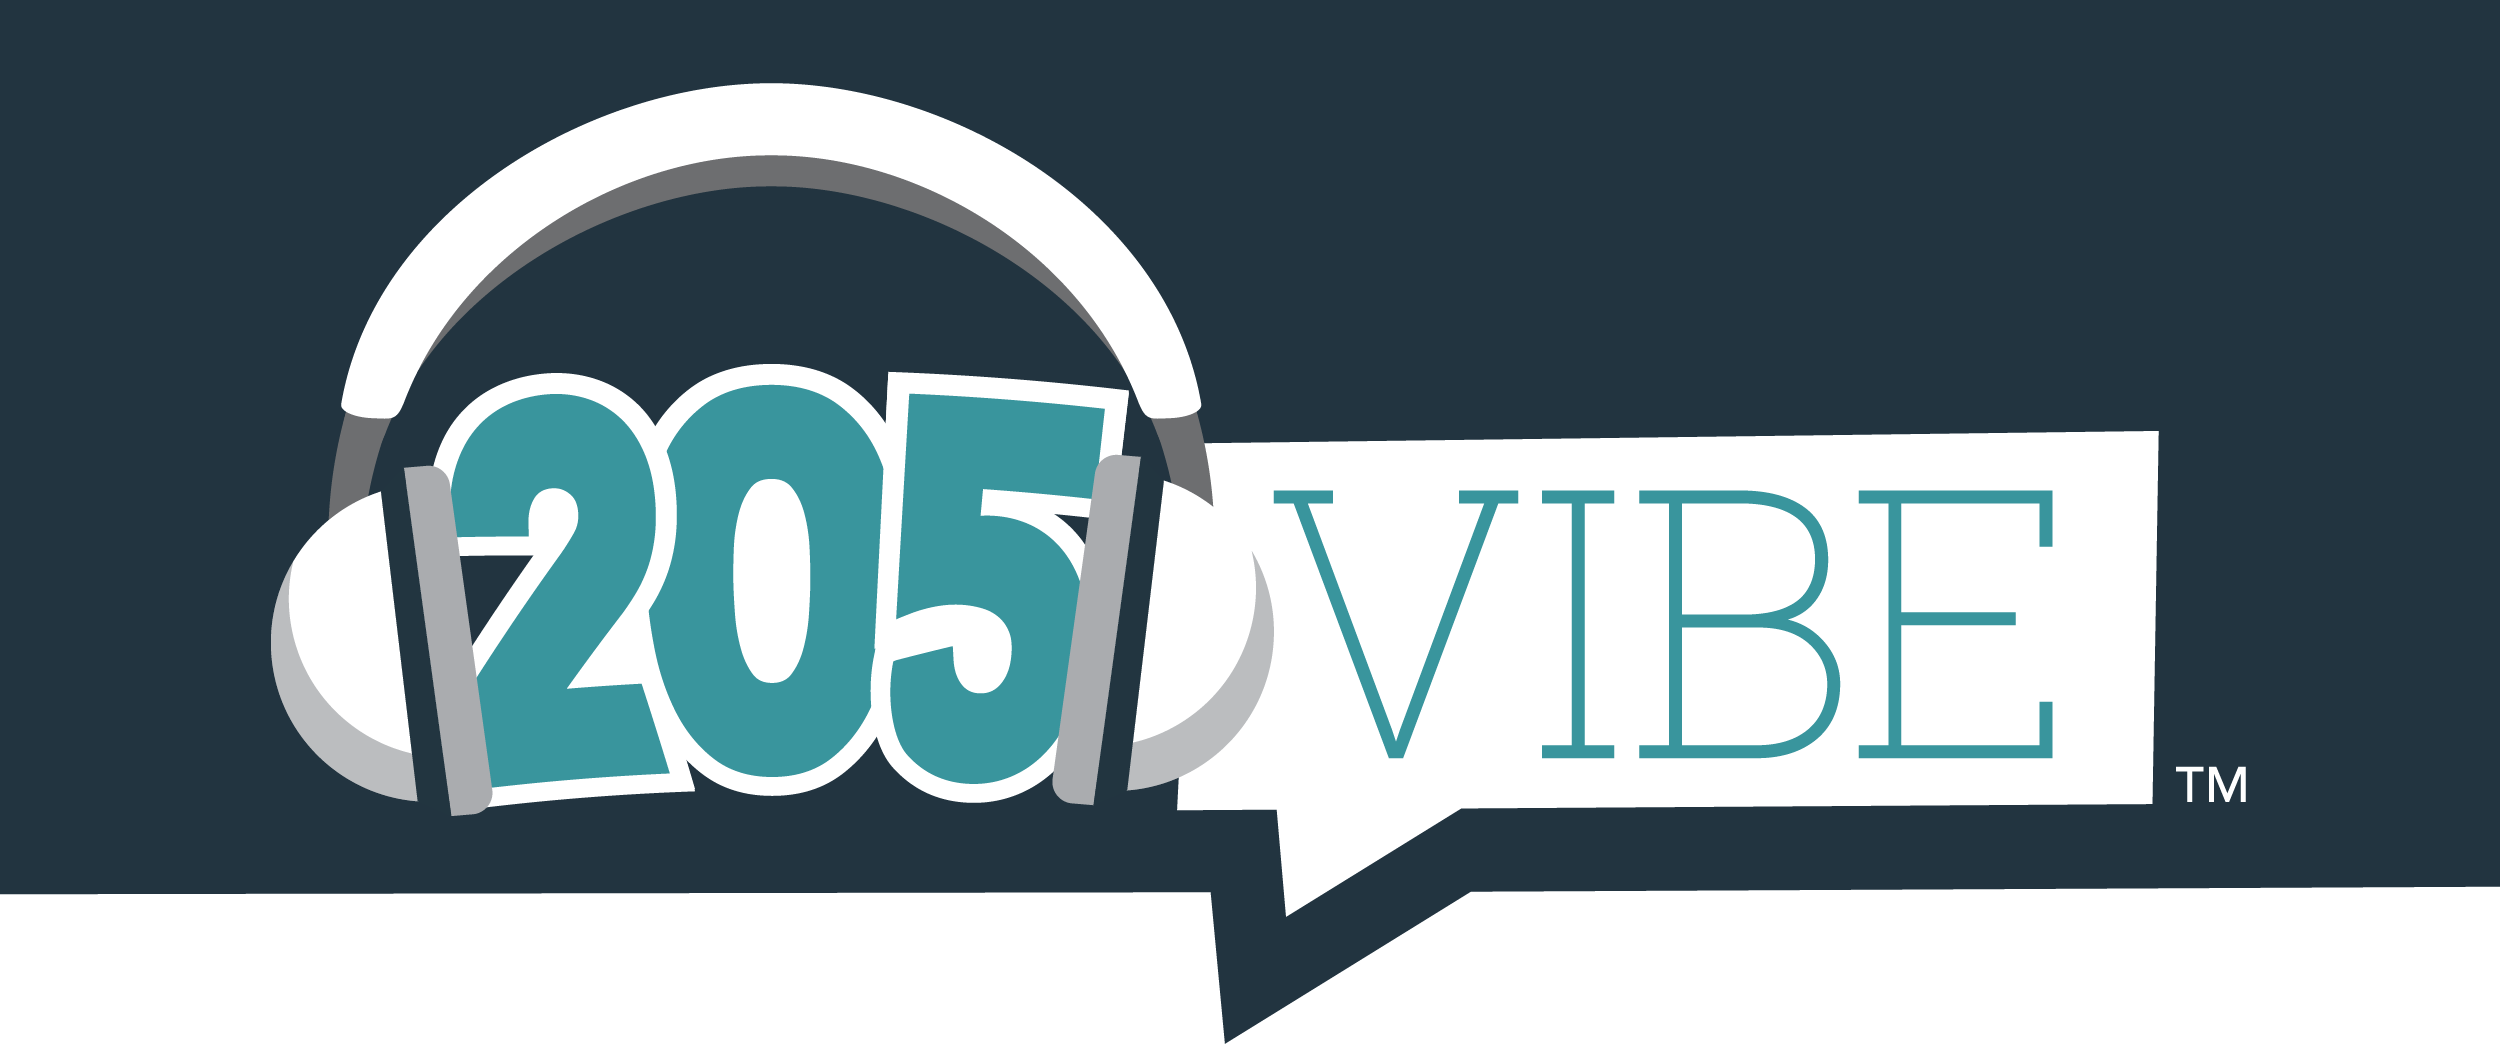 205 VIBE logo